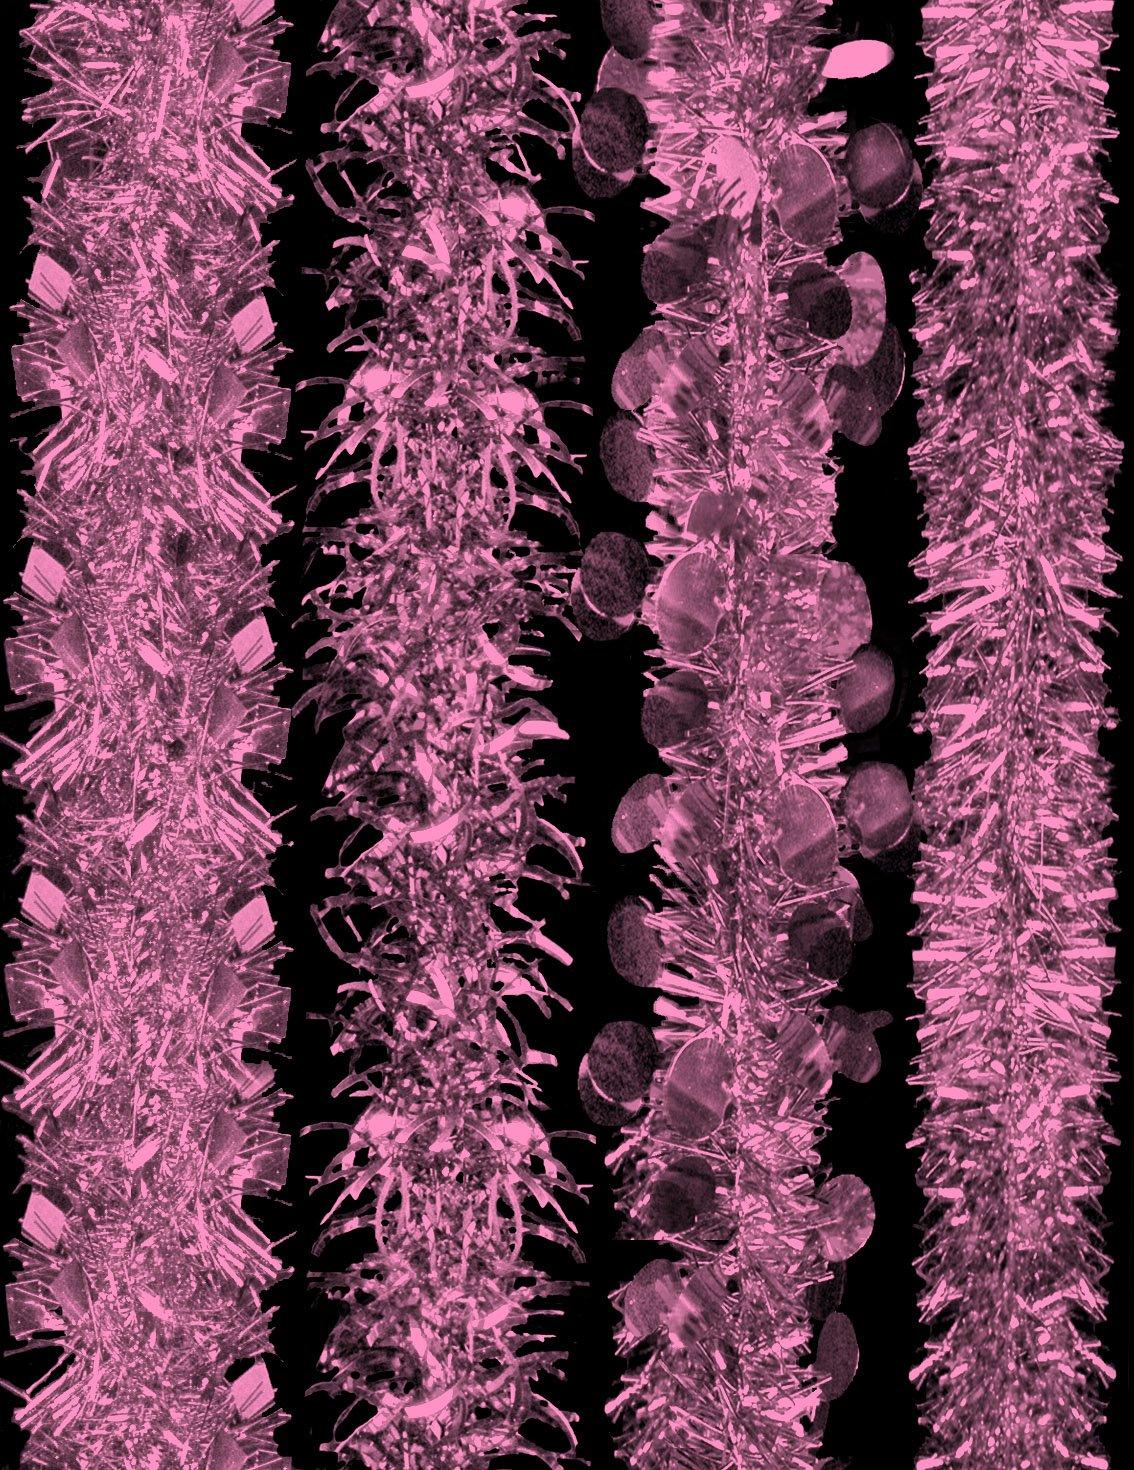 2m Blush Pink / Baby Pink5013206Tinsel - Decorated Christmas Tinsel - 4 Designs - 1 Chosen At Random. Davies Products